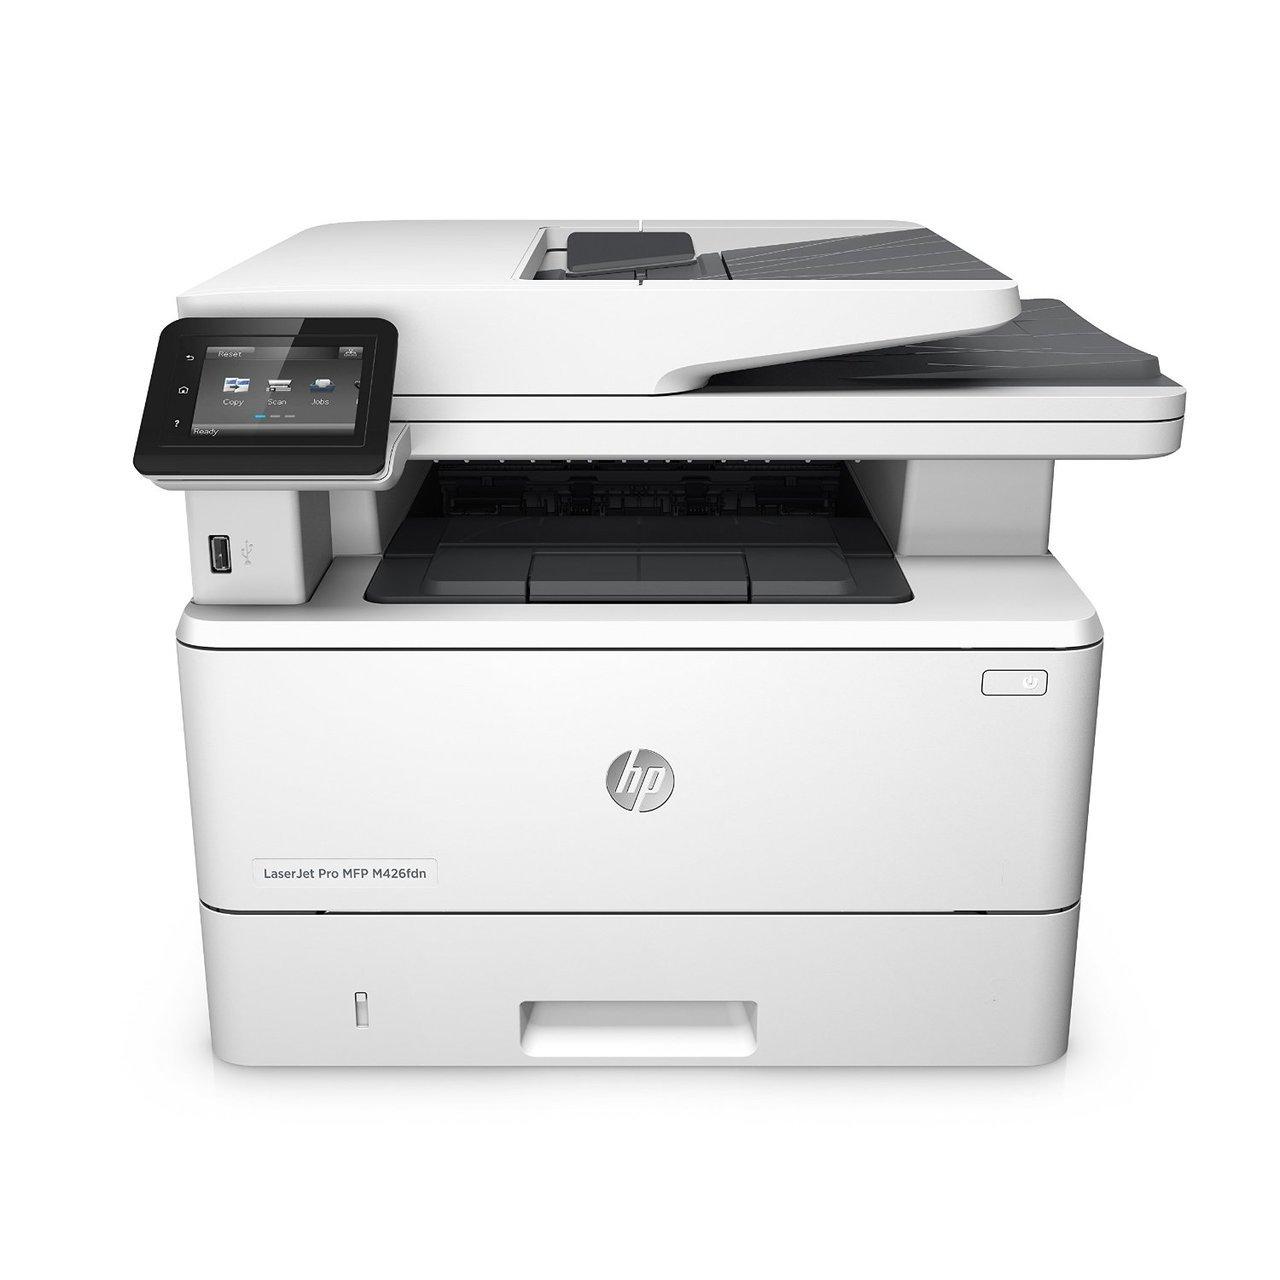 HP Laserjet Pro M477fdw Wireless All-in-One Color Printer CF379A